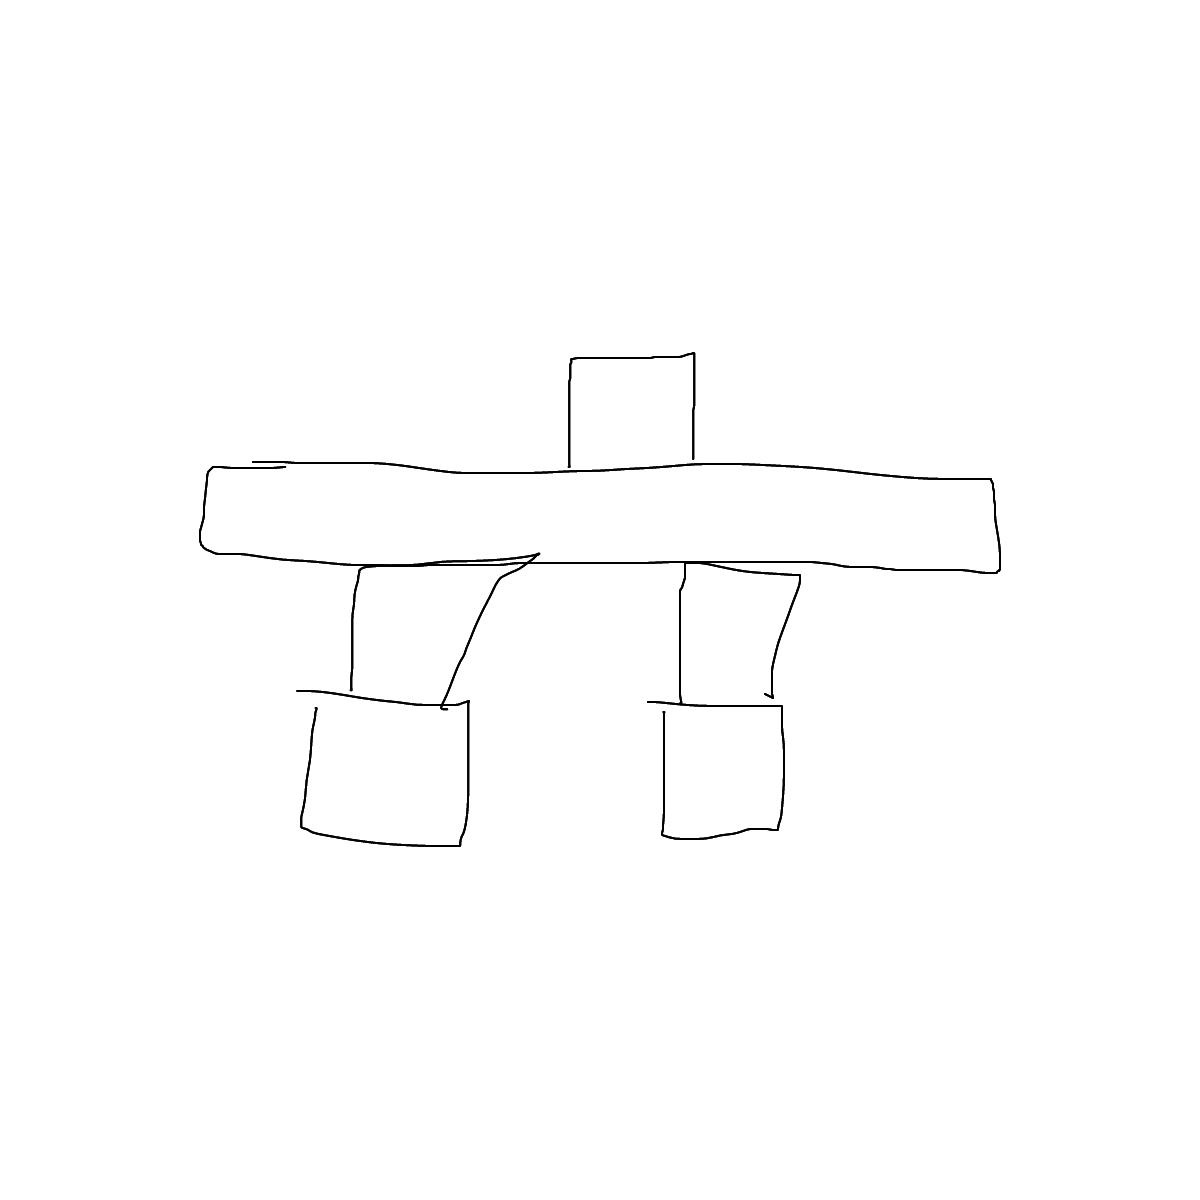 BAAAM drawing#17314 lat:61.5965232849121100lng: -93.6782226562500000